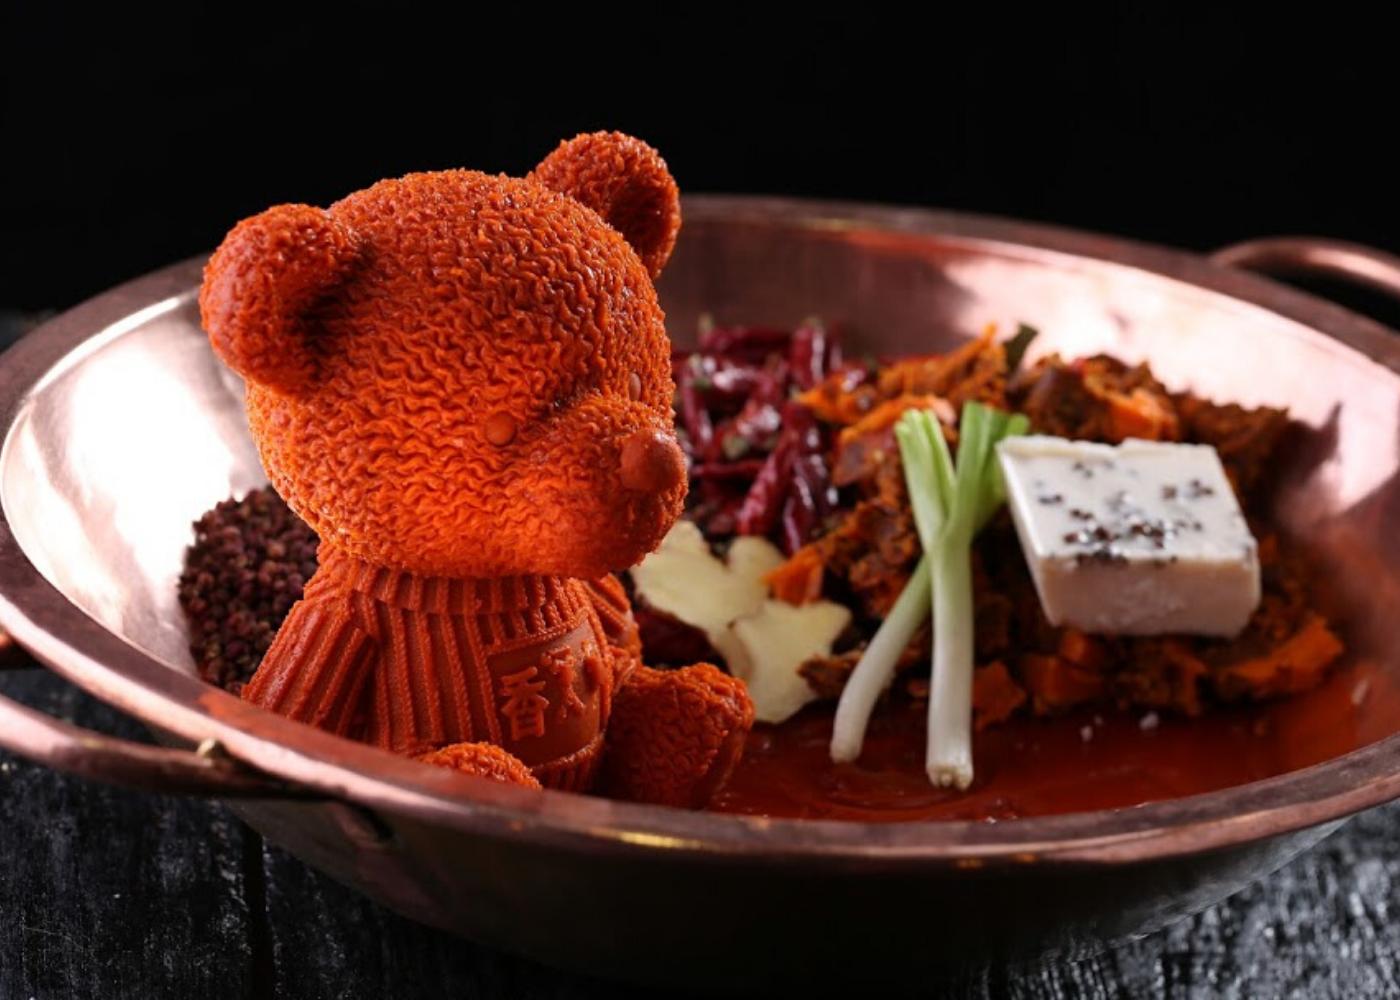 Spice World Hot Pot | Steamboat restaurants in Singapore